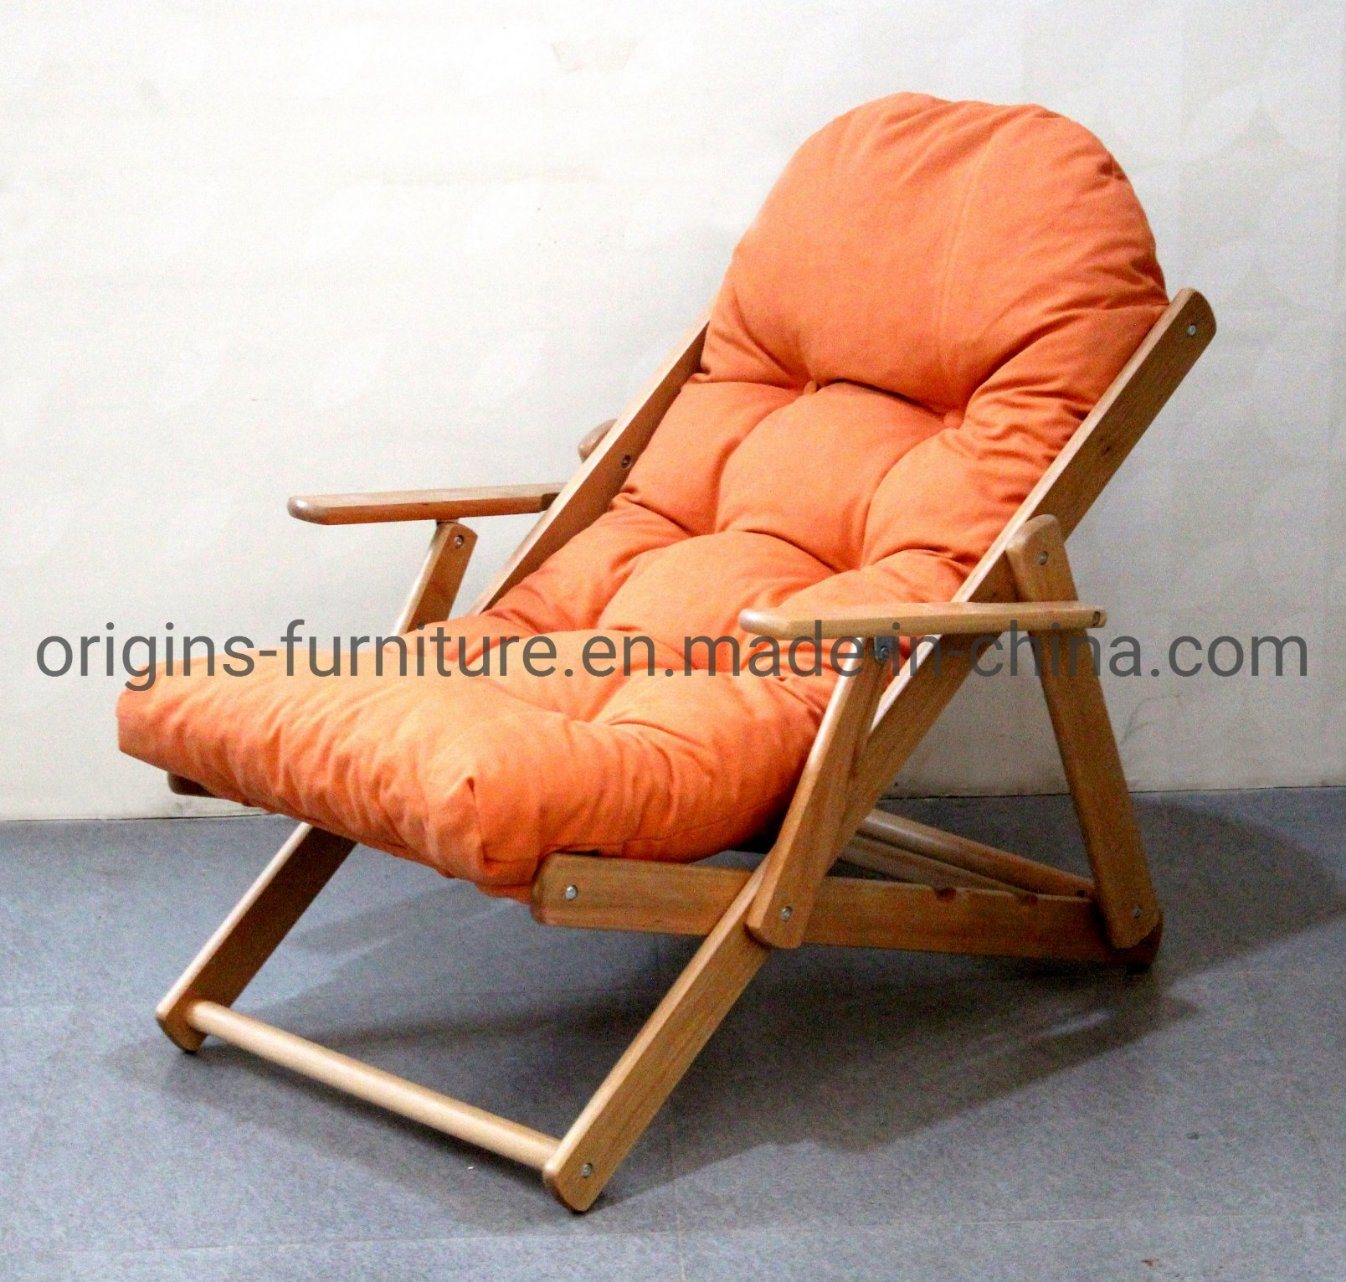 China Folding Reclining Lounge Chair